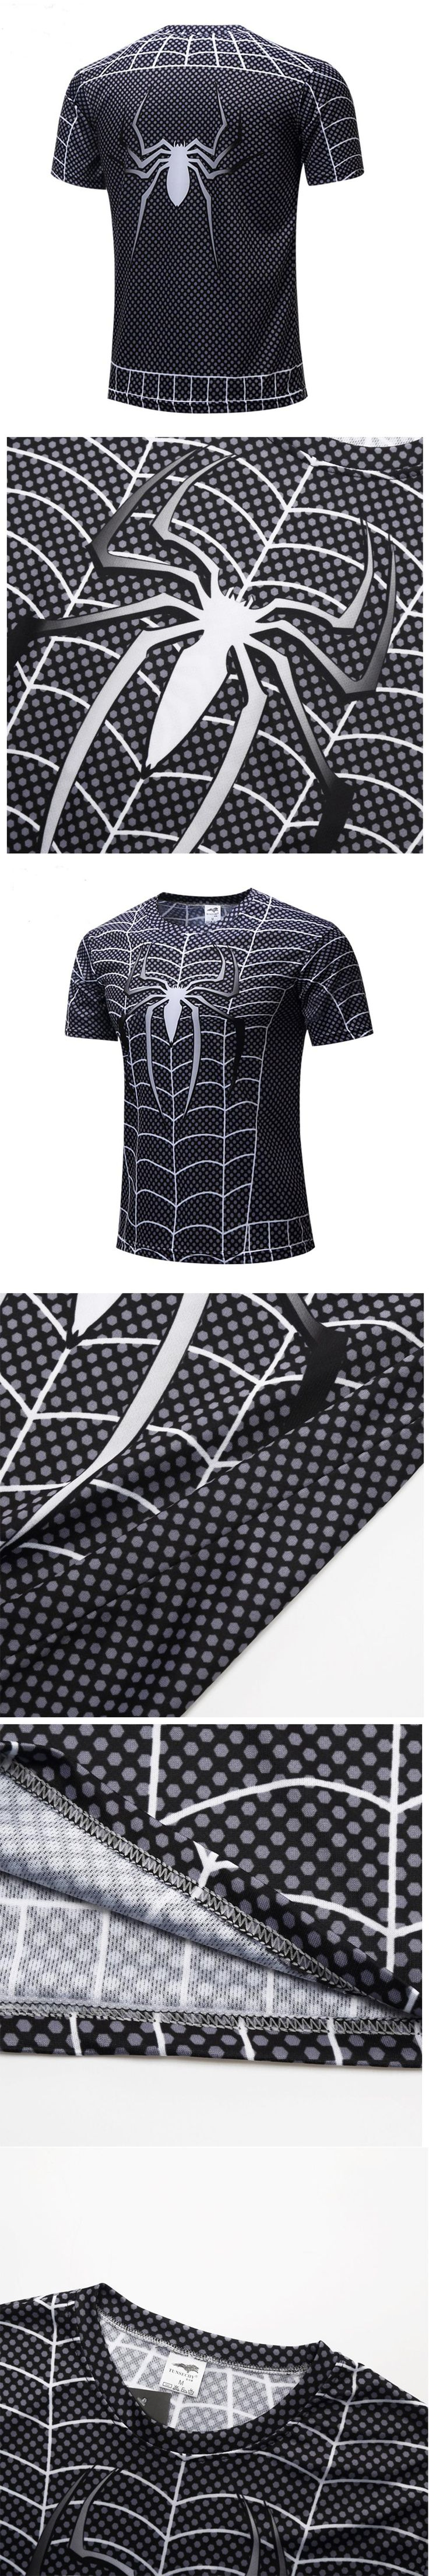 best 25 new spiderman costume ideas on pinterest new